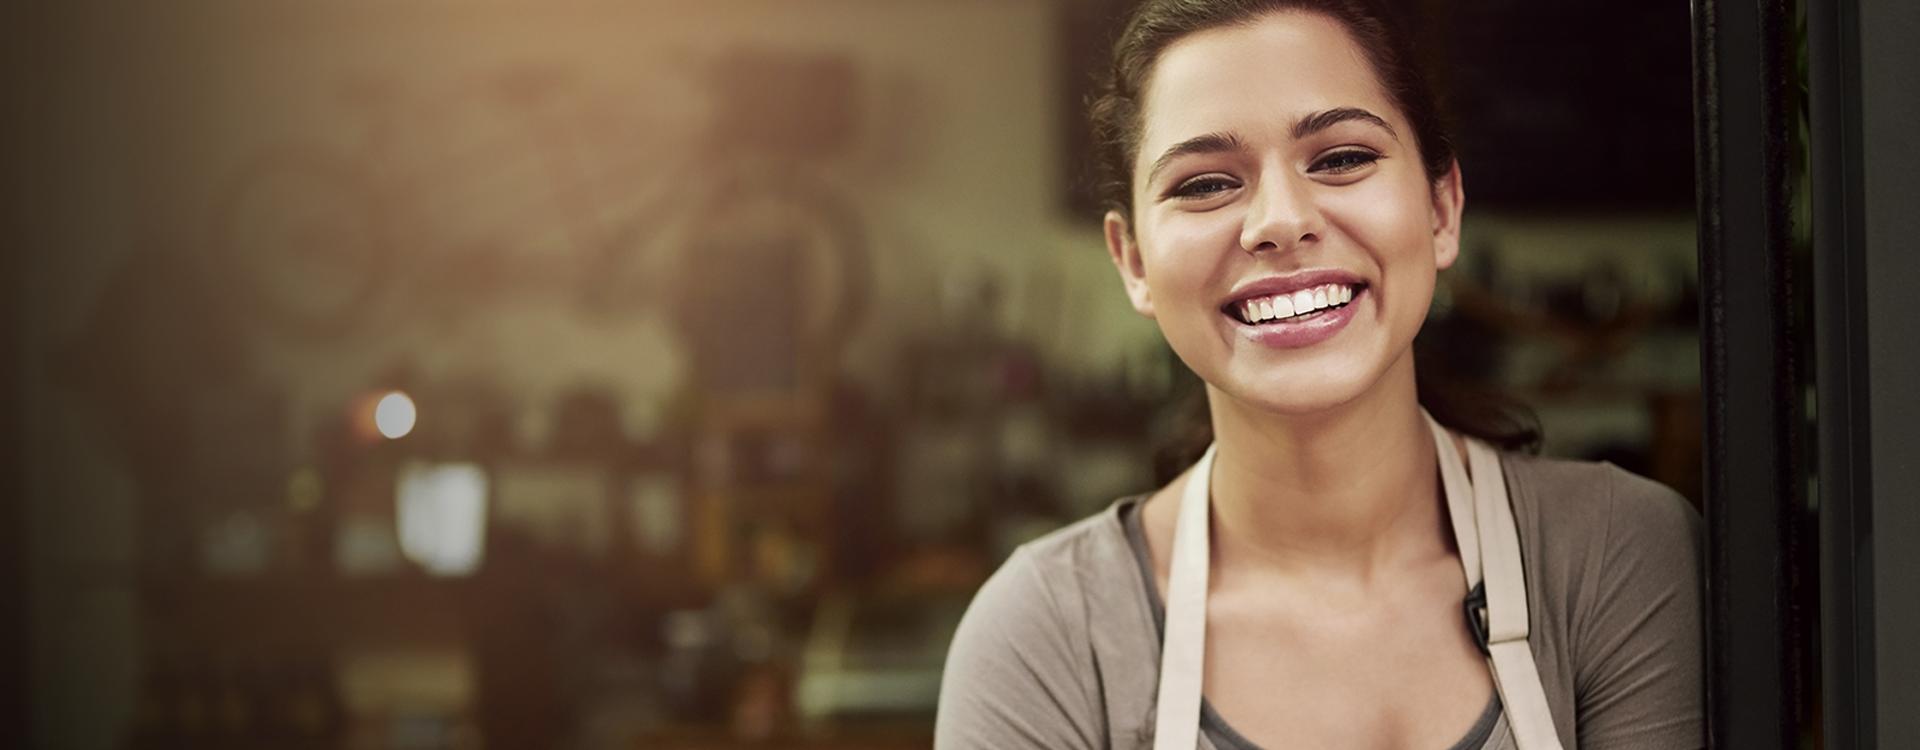 Happy smiling barista